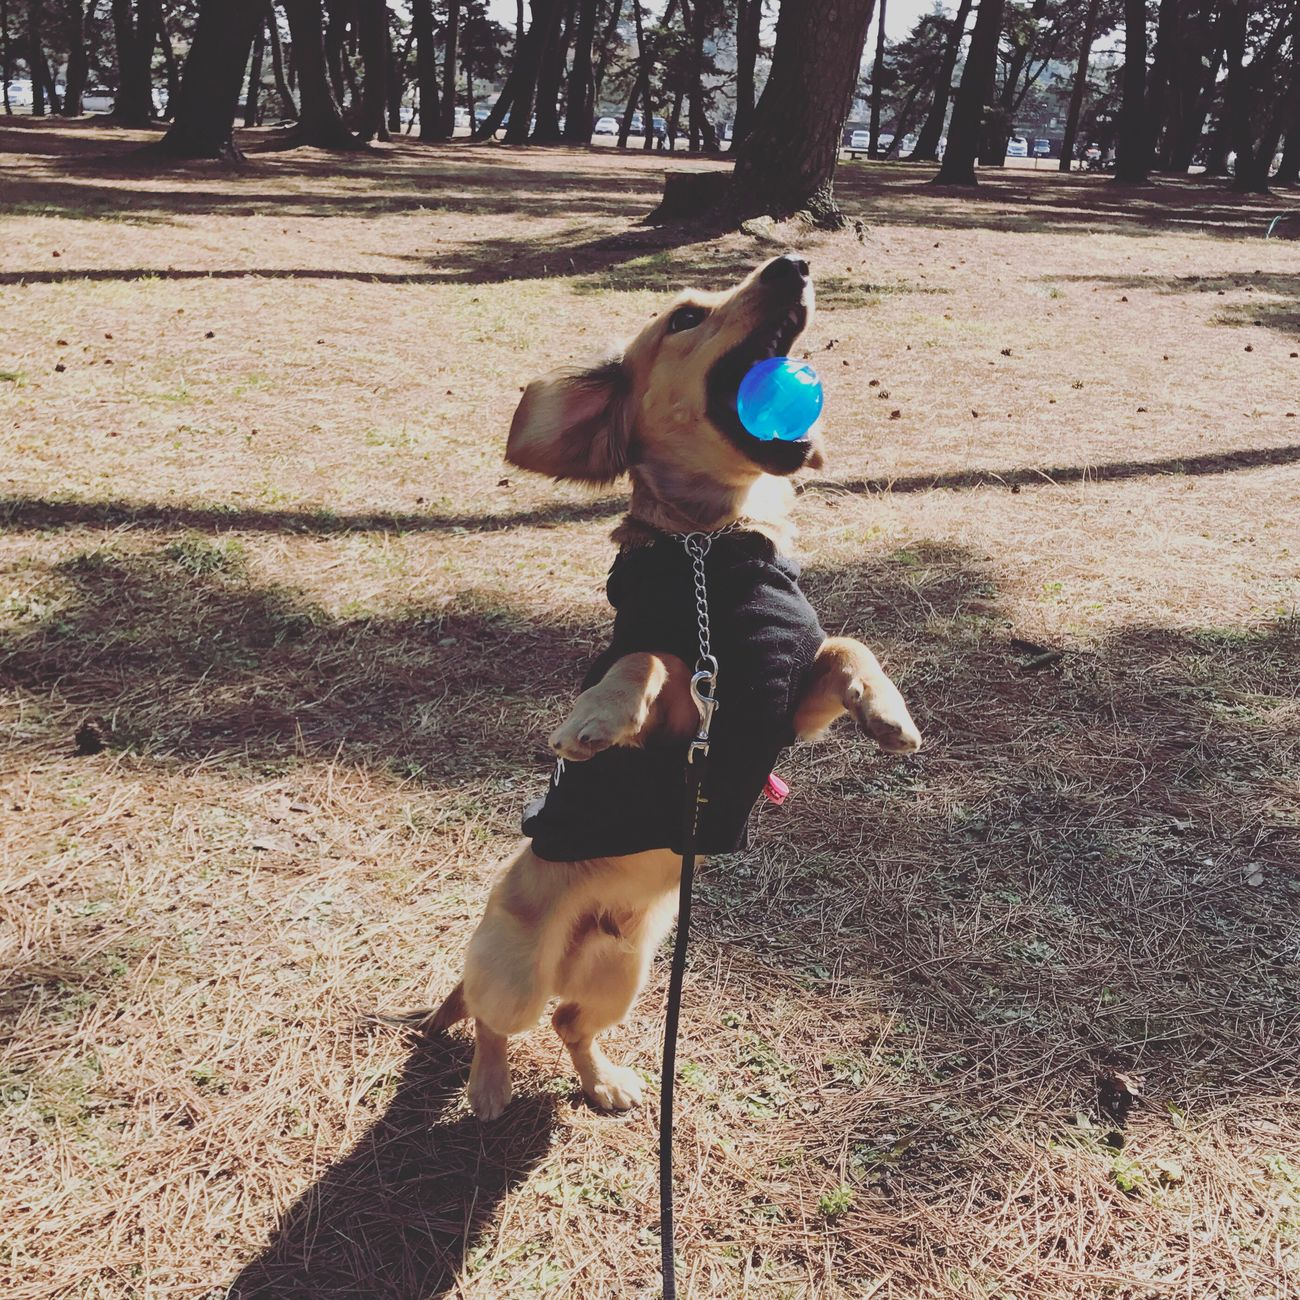 Minituredachshund Dog Outdoors Playing